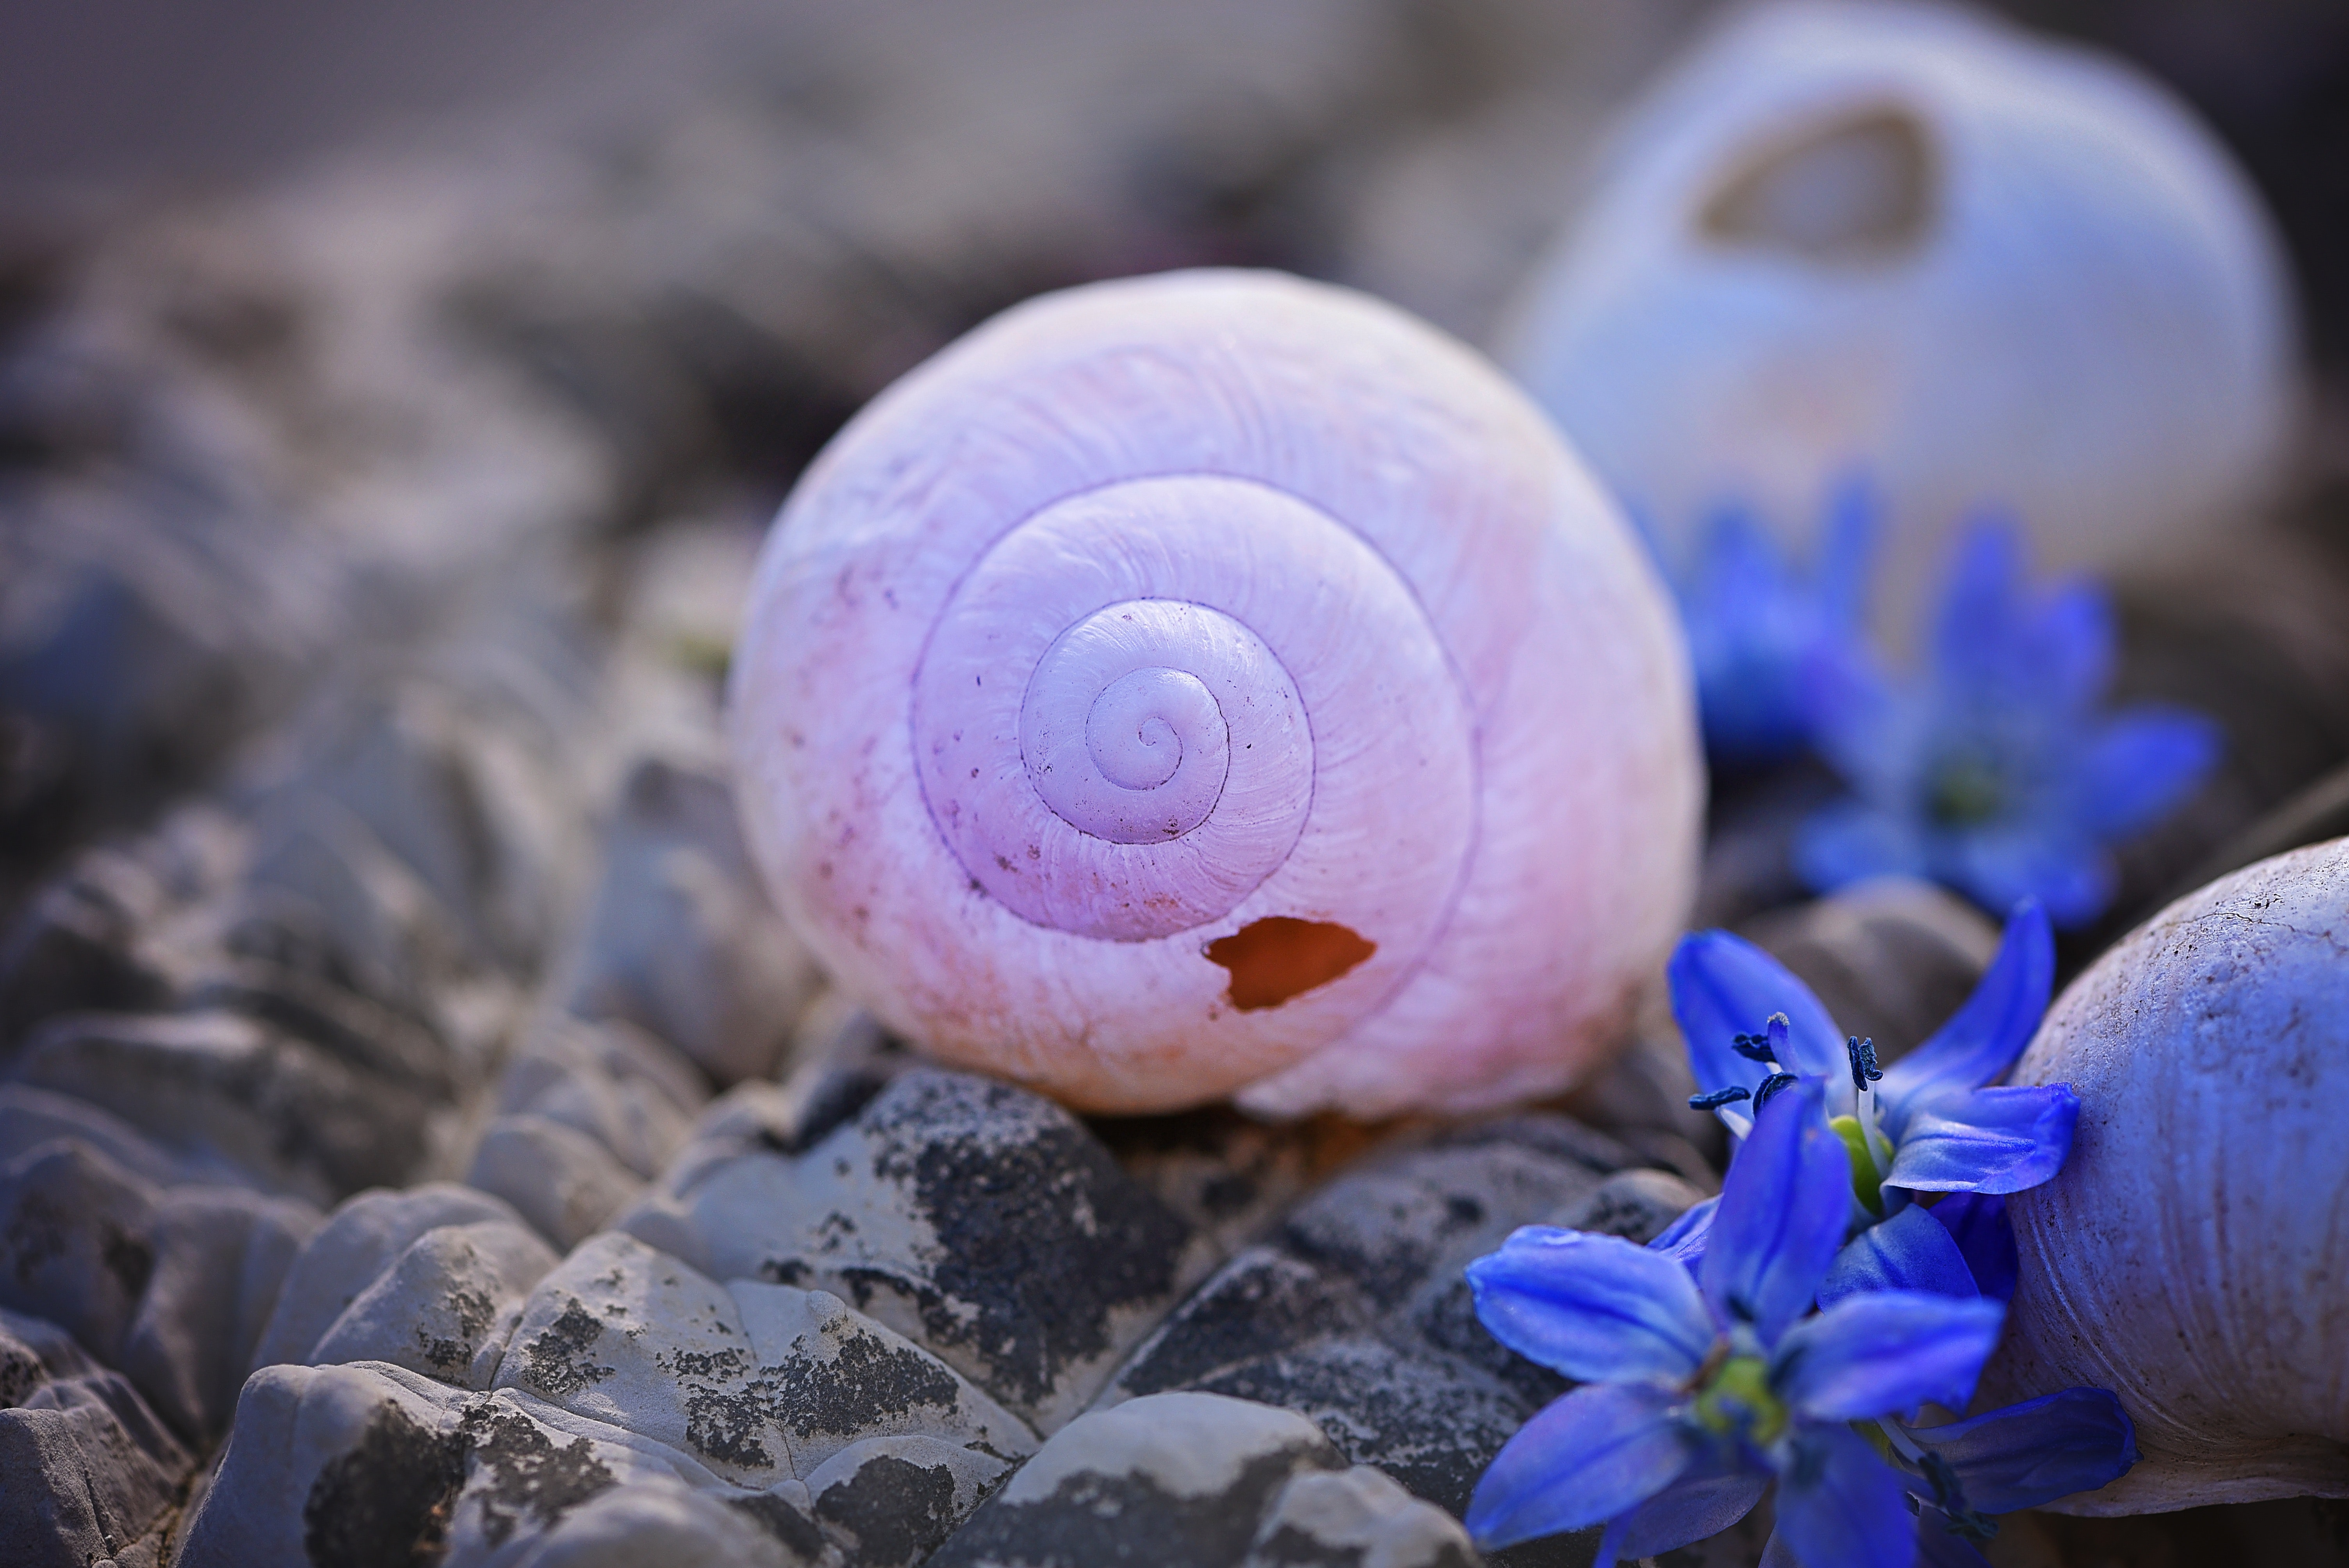 White snail shell on rocks photo